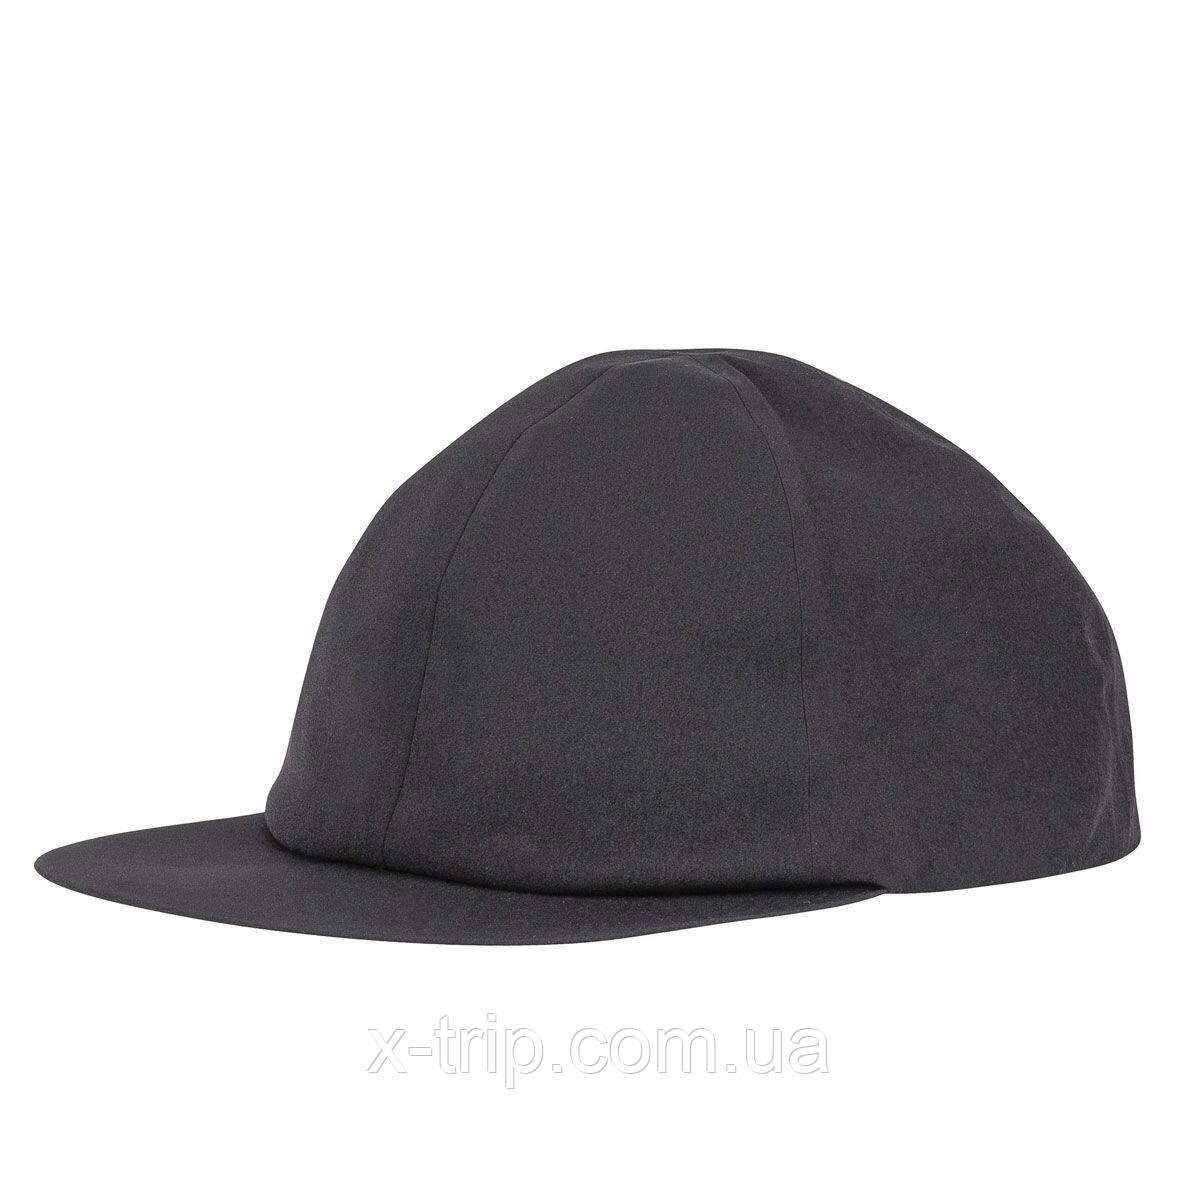 Кепка чоловіча Marmot Altitude Hat, Black, (MRT 13440.001)